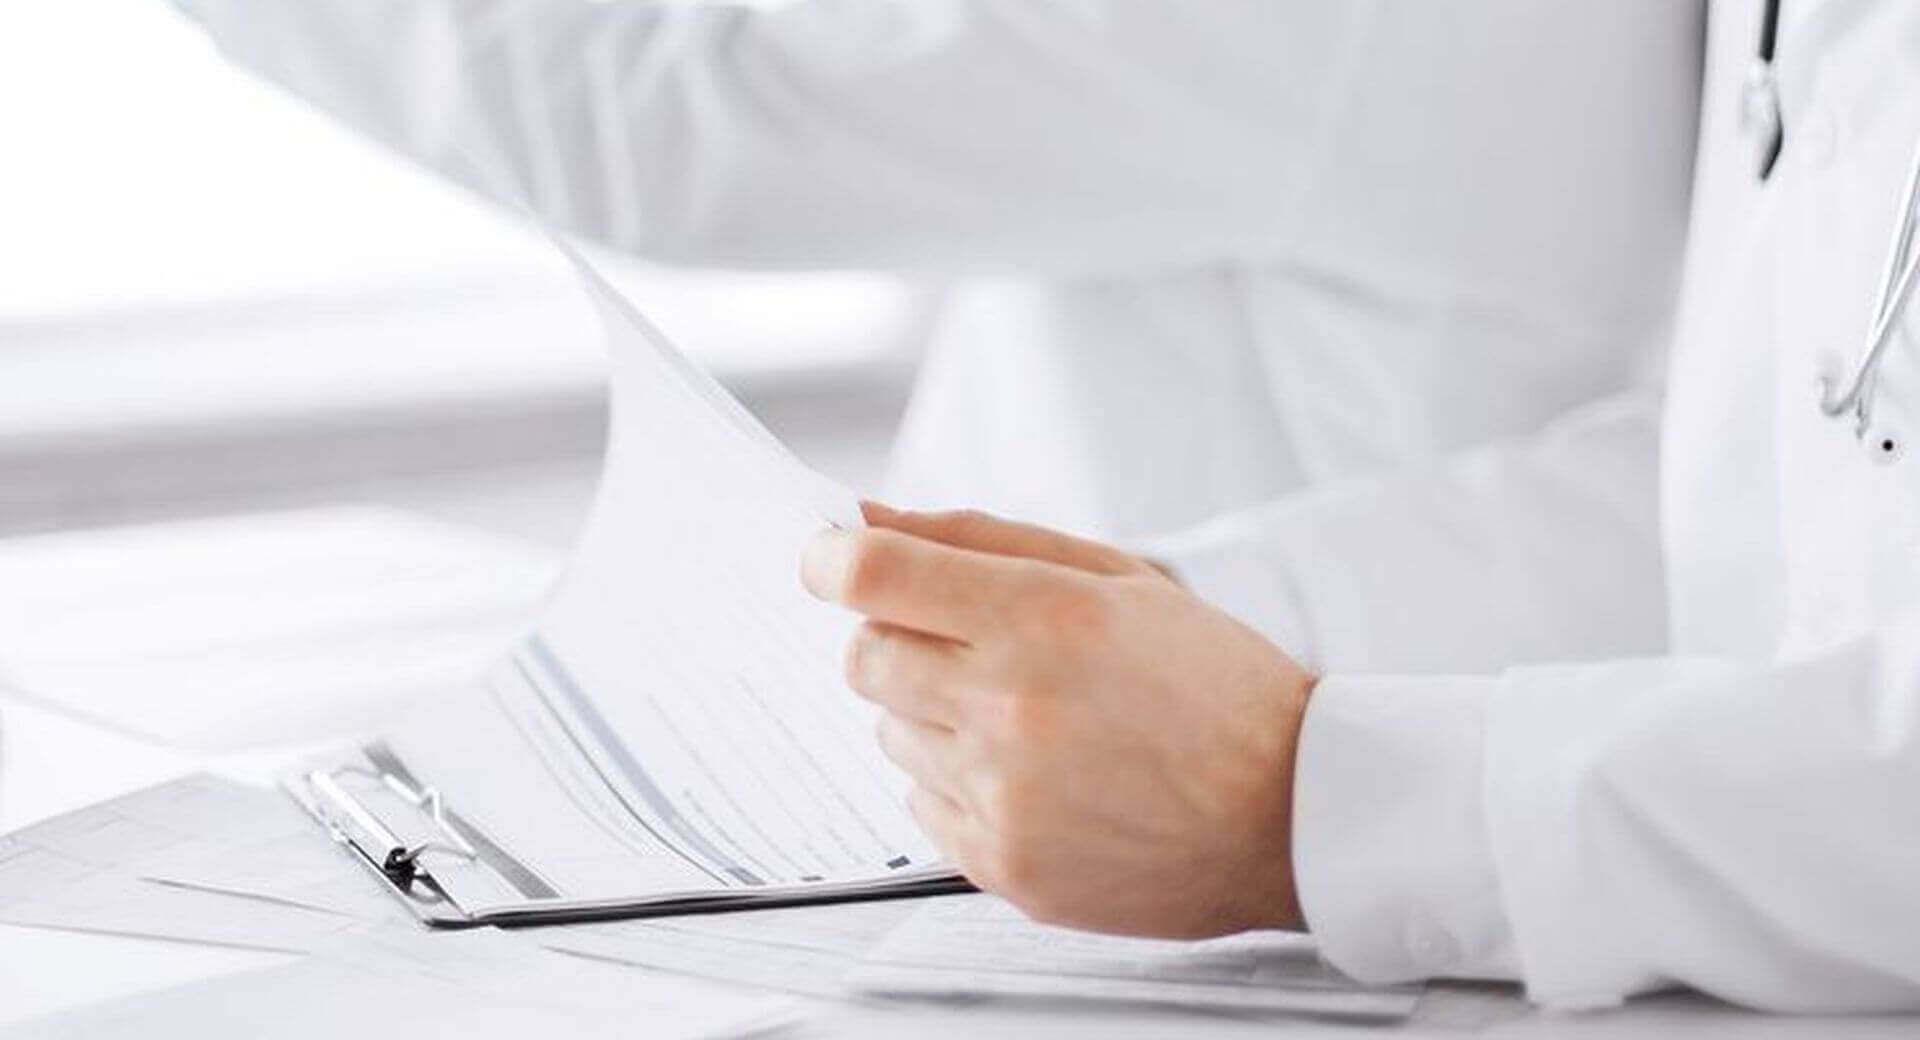 Orthopäde, Chrirurg Bonn, Diagnose